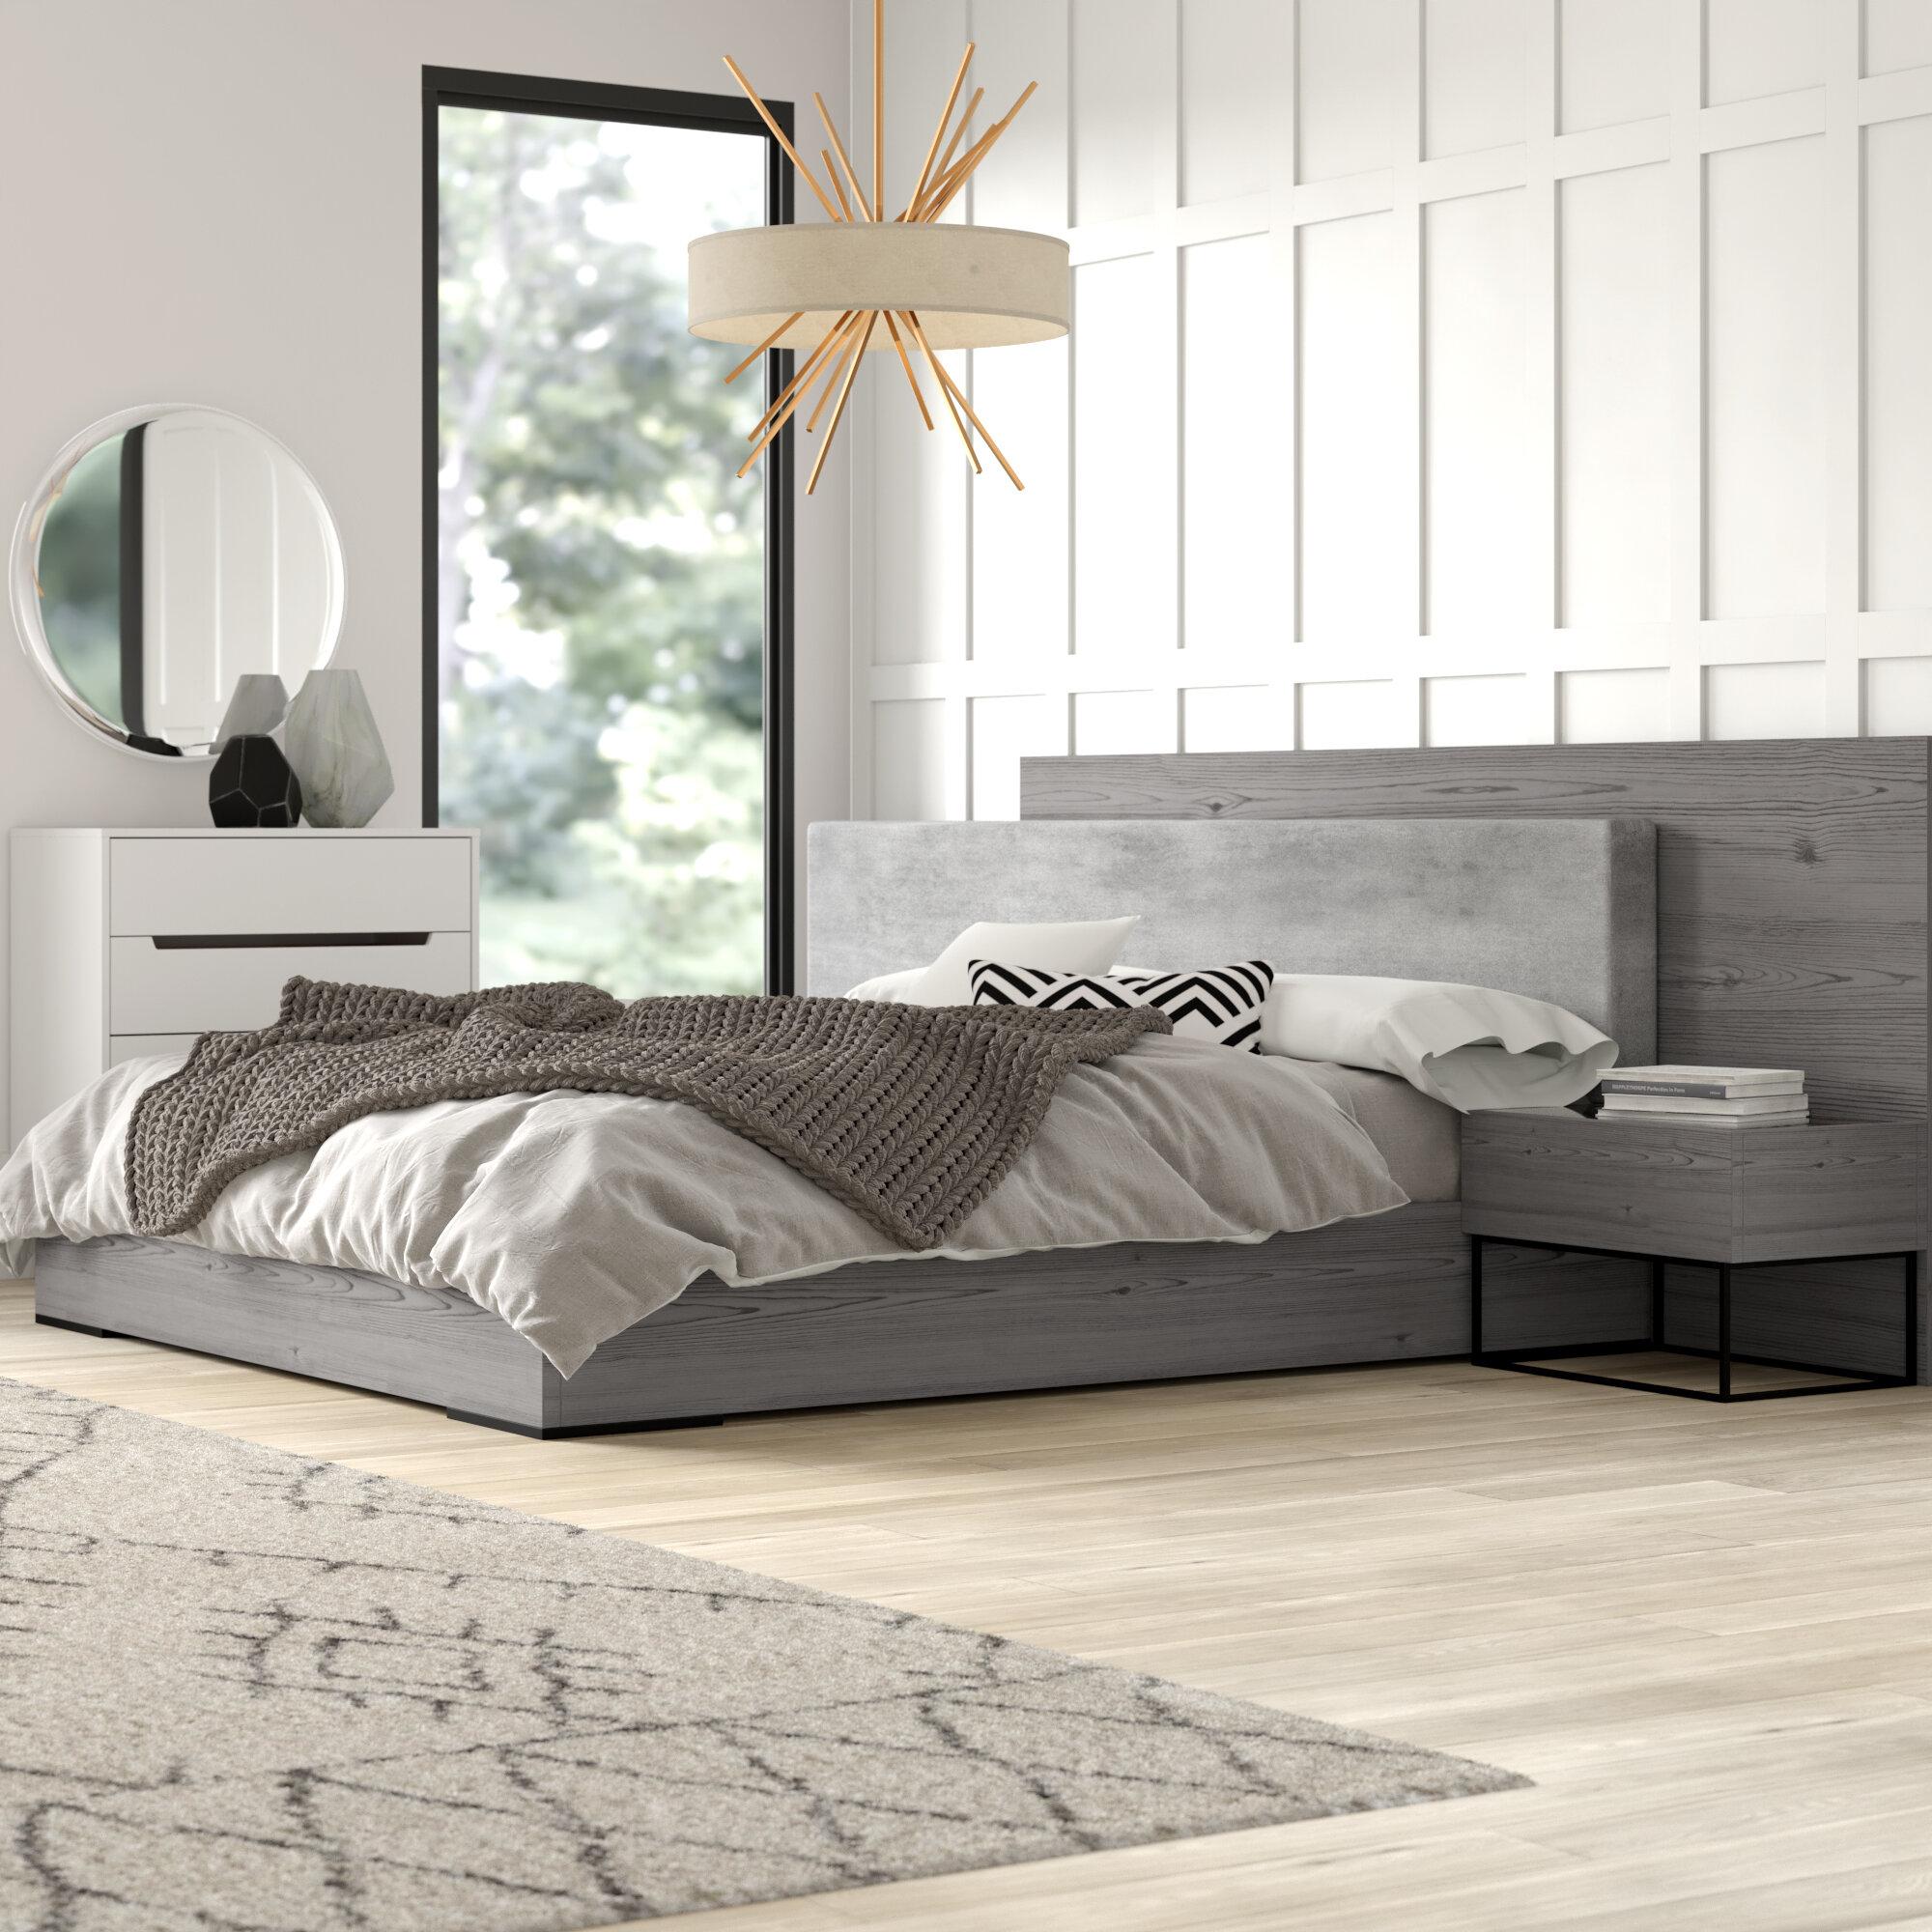 Salley Upholstered Platform 5 Piece Bedroom Set